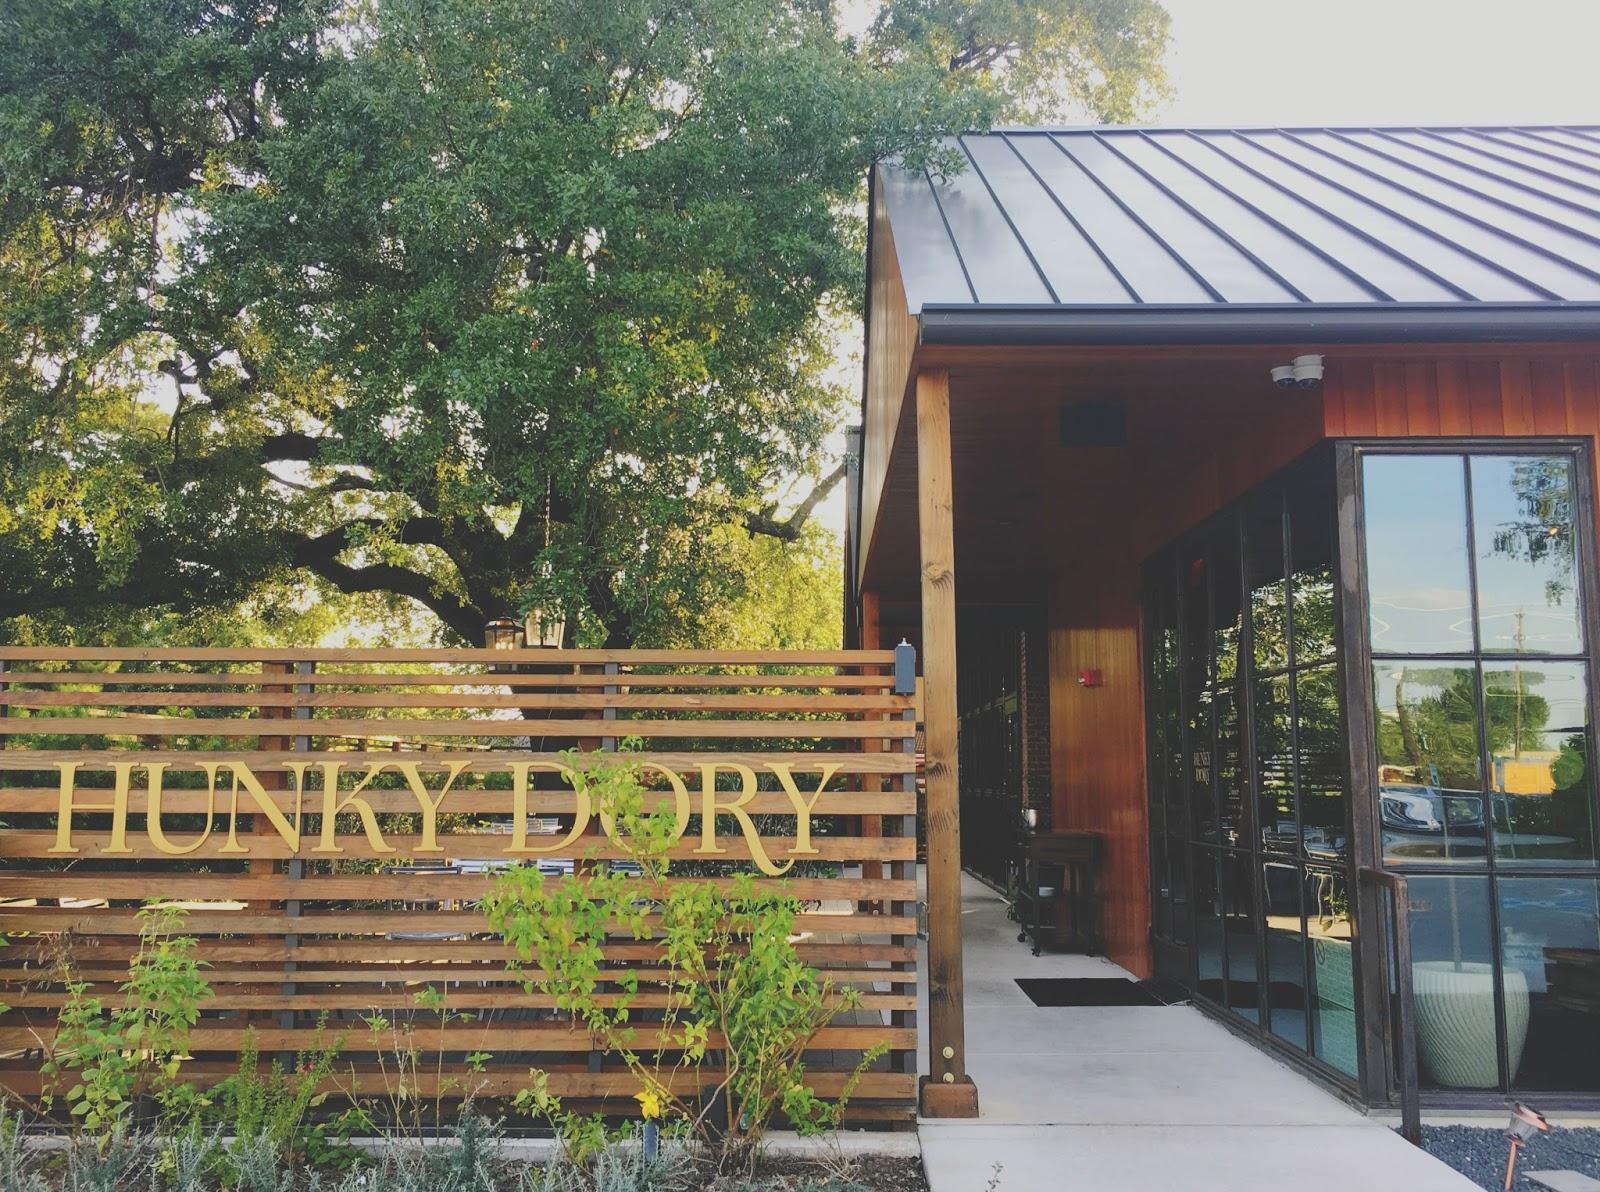 Hunky Dory - A restaurant in Houston, Texas